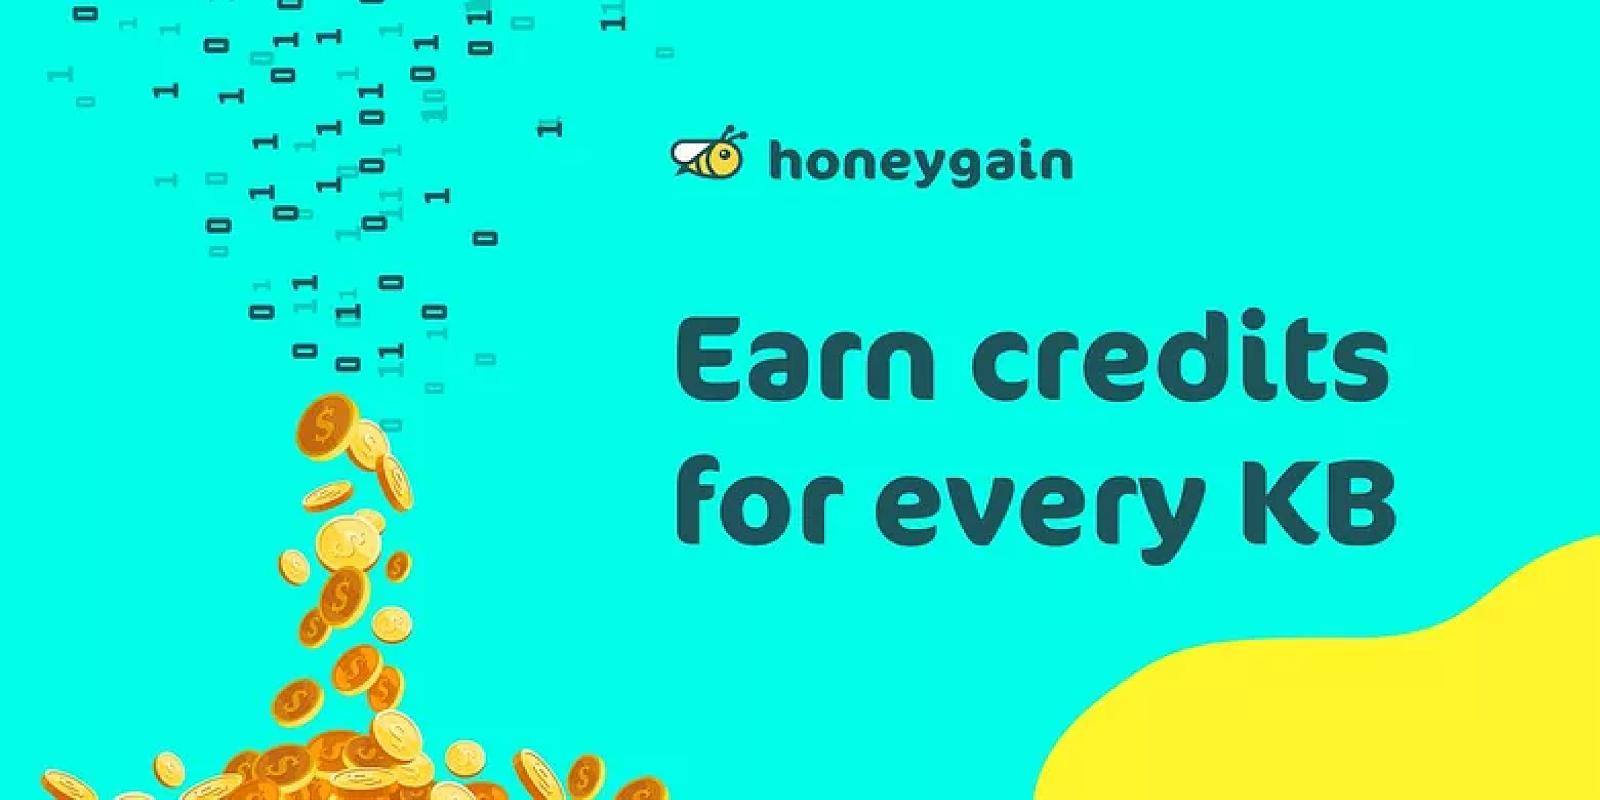 oneygain app,honeygain apk,honeygain login,honeygain ios,honeygain review,honeygain legit,honeygain sign up,honeygain is safe,honeygain payout,honeygain is real or fake,is honeygain legit,dashboard honeygain,is honeygain safe,how to earn in honeygain,descargar honeygain,que es honeygain,Tải Honeygain,Tại Honeygain,Tài Honeygain,Honeygain có lừa đảo không,Honeygain review,App Honeygain,honeygain co lua ao khong,tai honeygain,honeygain review,app honeygain,https dashboard honeygain com sign up,cach kiem tien tren honeygain,app treo may kiem tien,han mem treo may,packetstream la gi,app honeygain,auto hana kiem tien